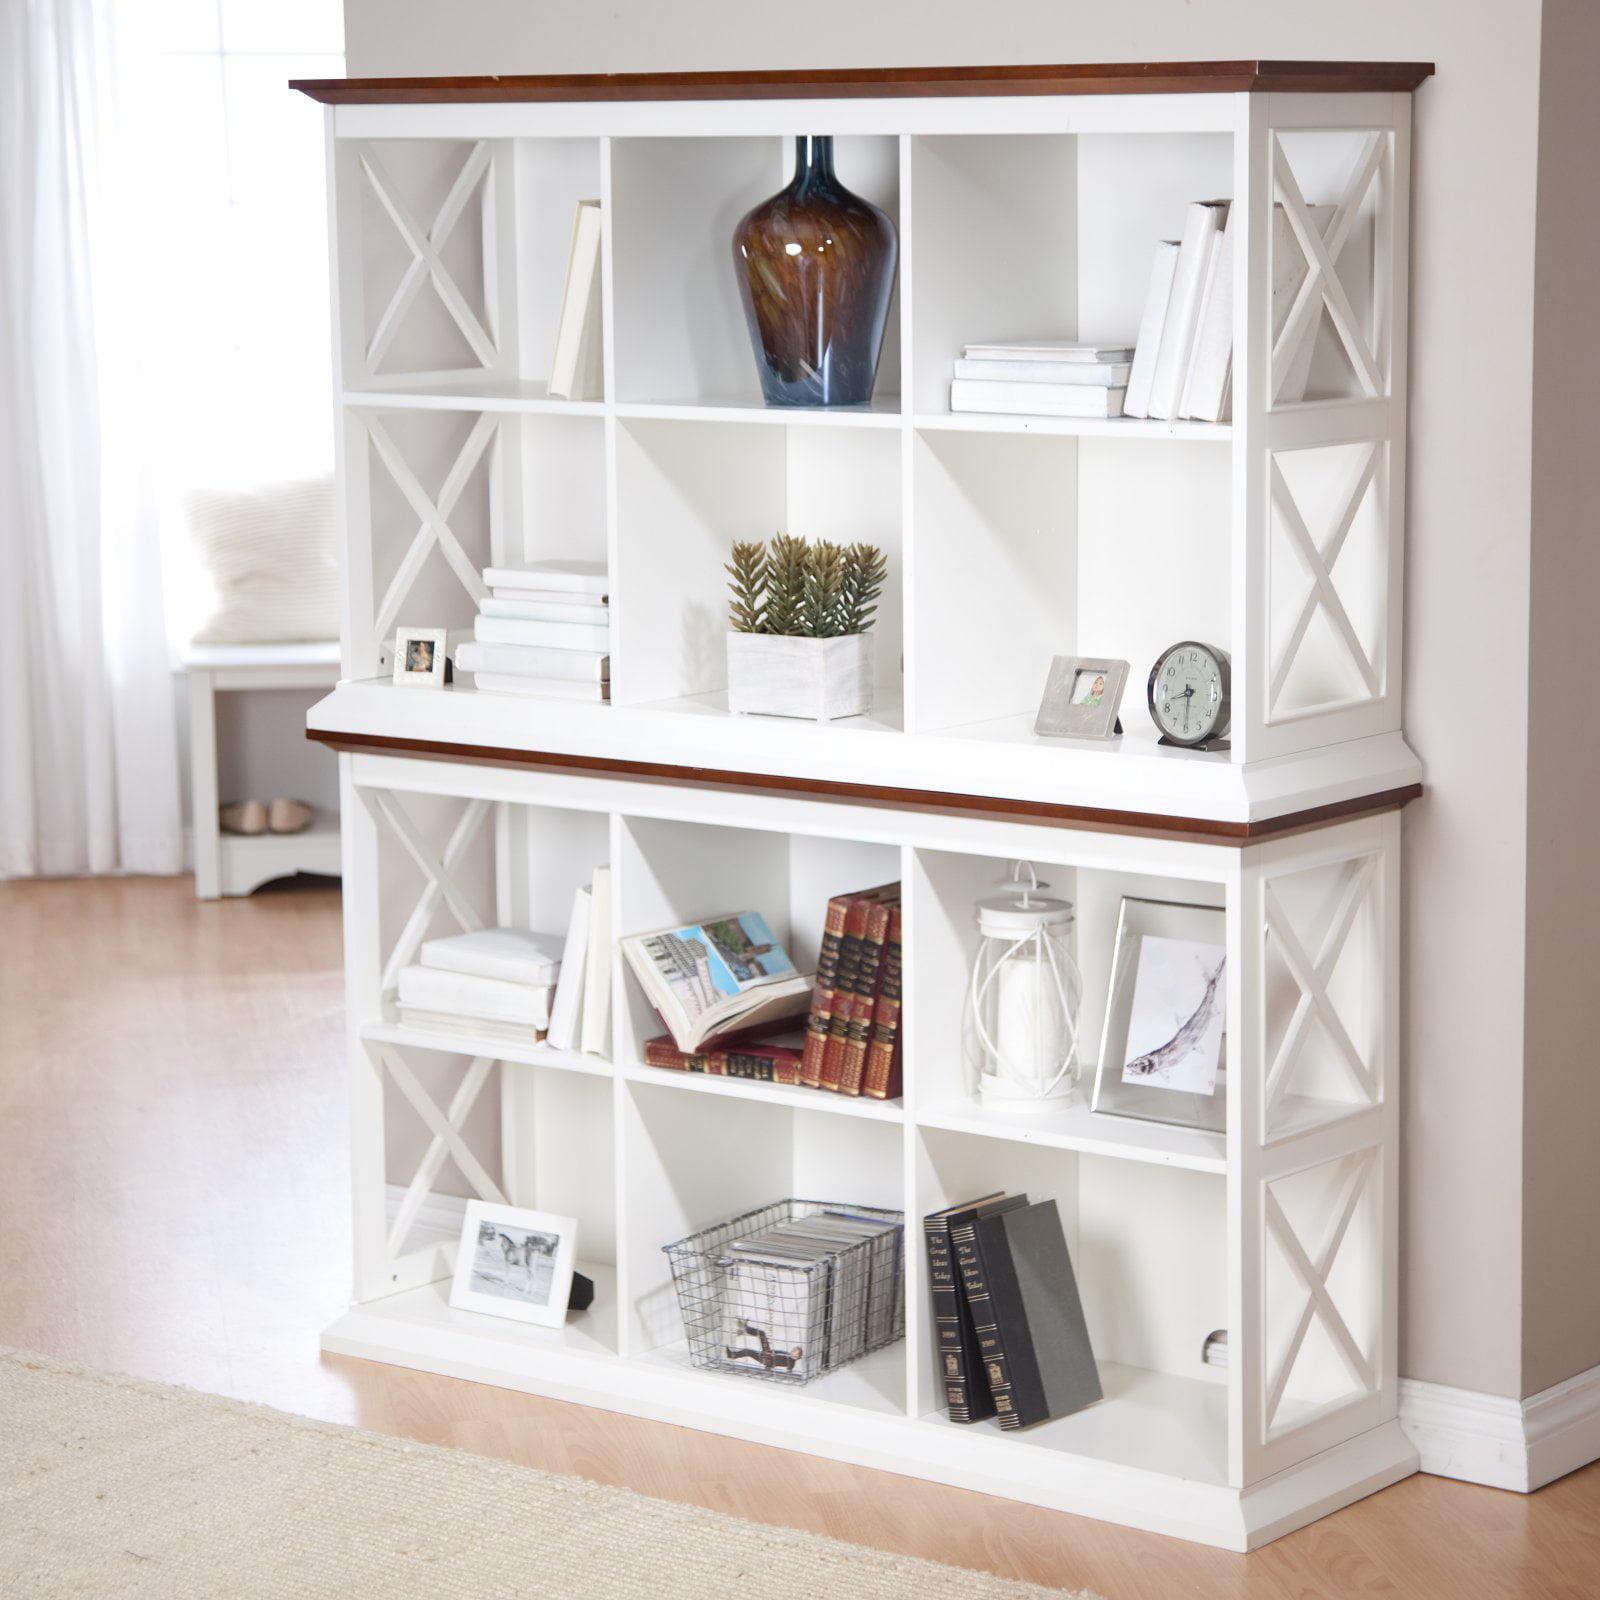 Belham Living Hampton Console Table 2 Shelf Bookcase - White/Oak -  Walmart